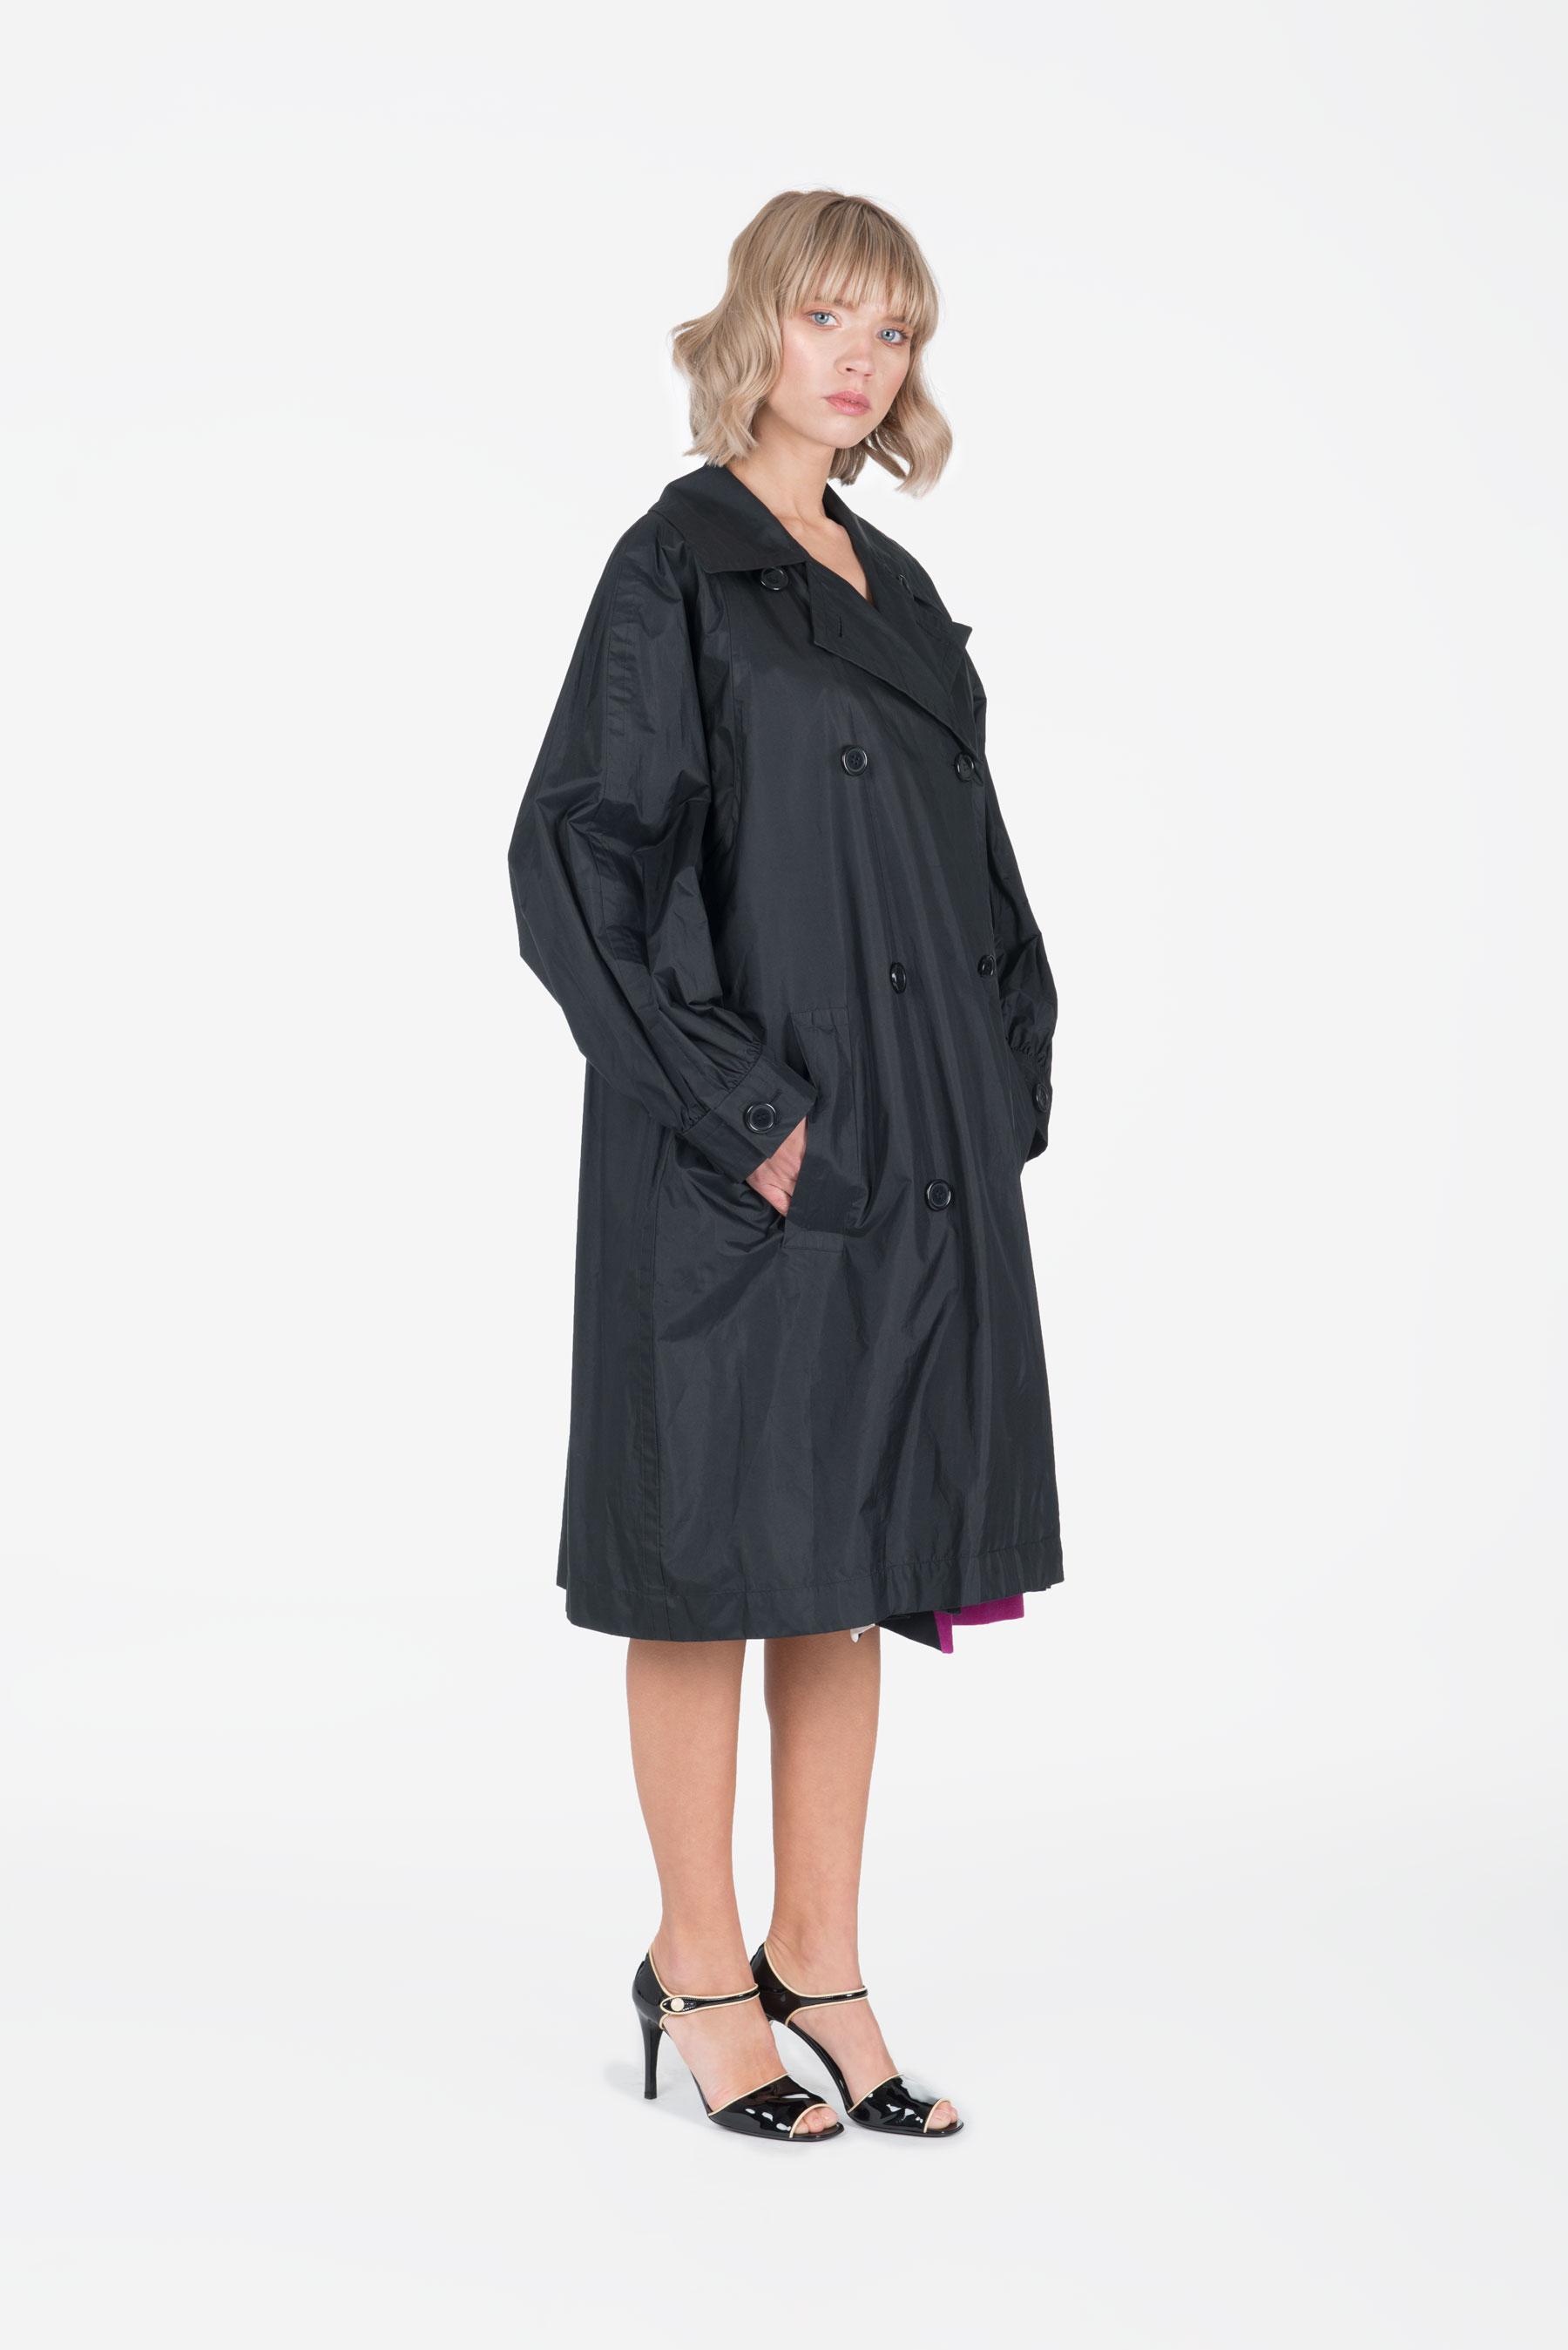 807ebe10b35 Yves Saint Laurent - elastane trench coat TRENCHS - Shop Millesimé ...